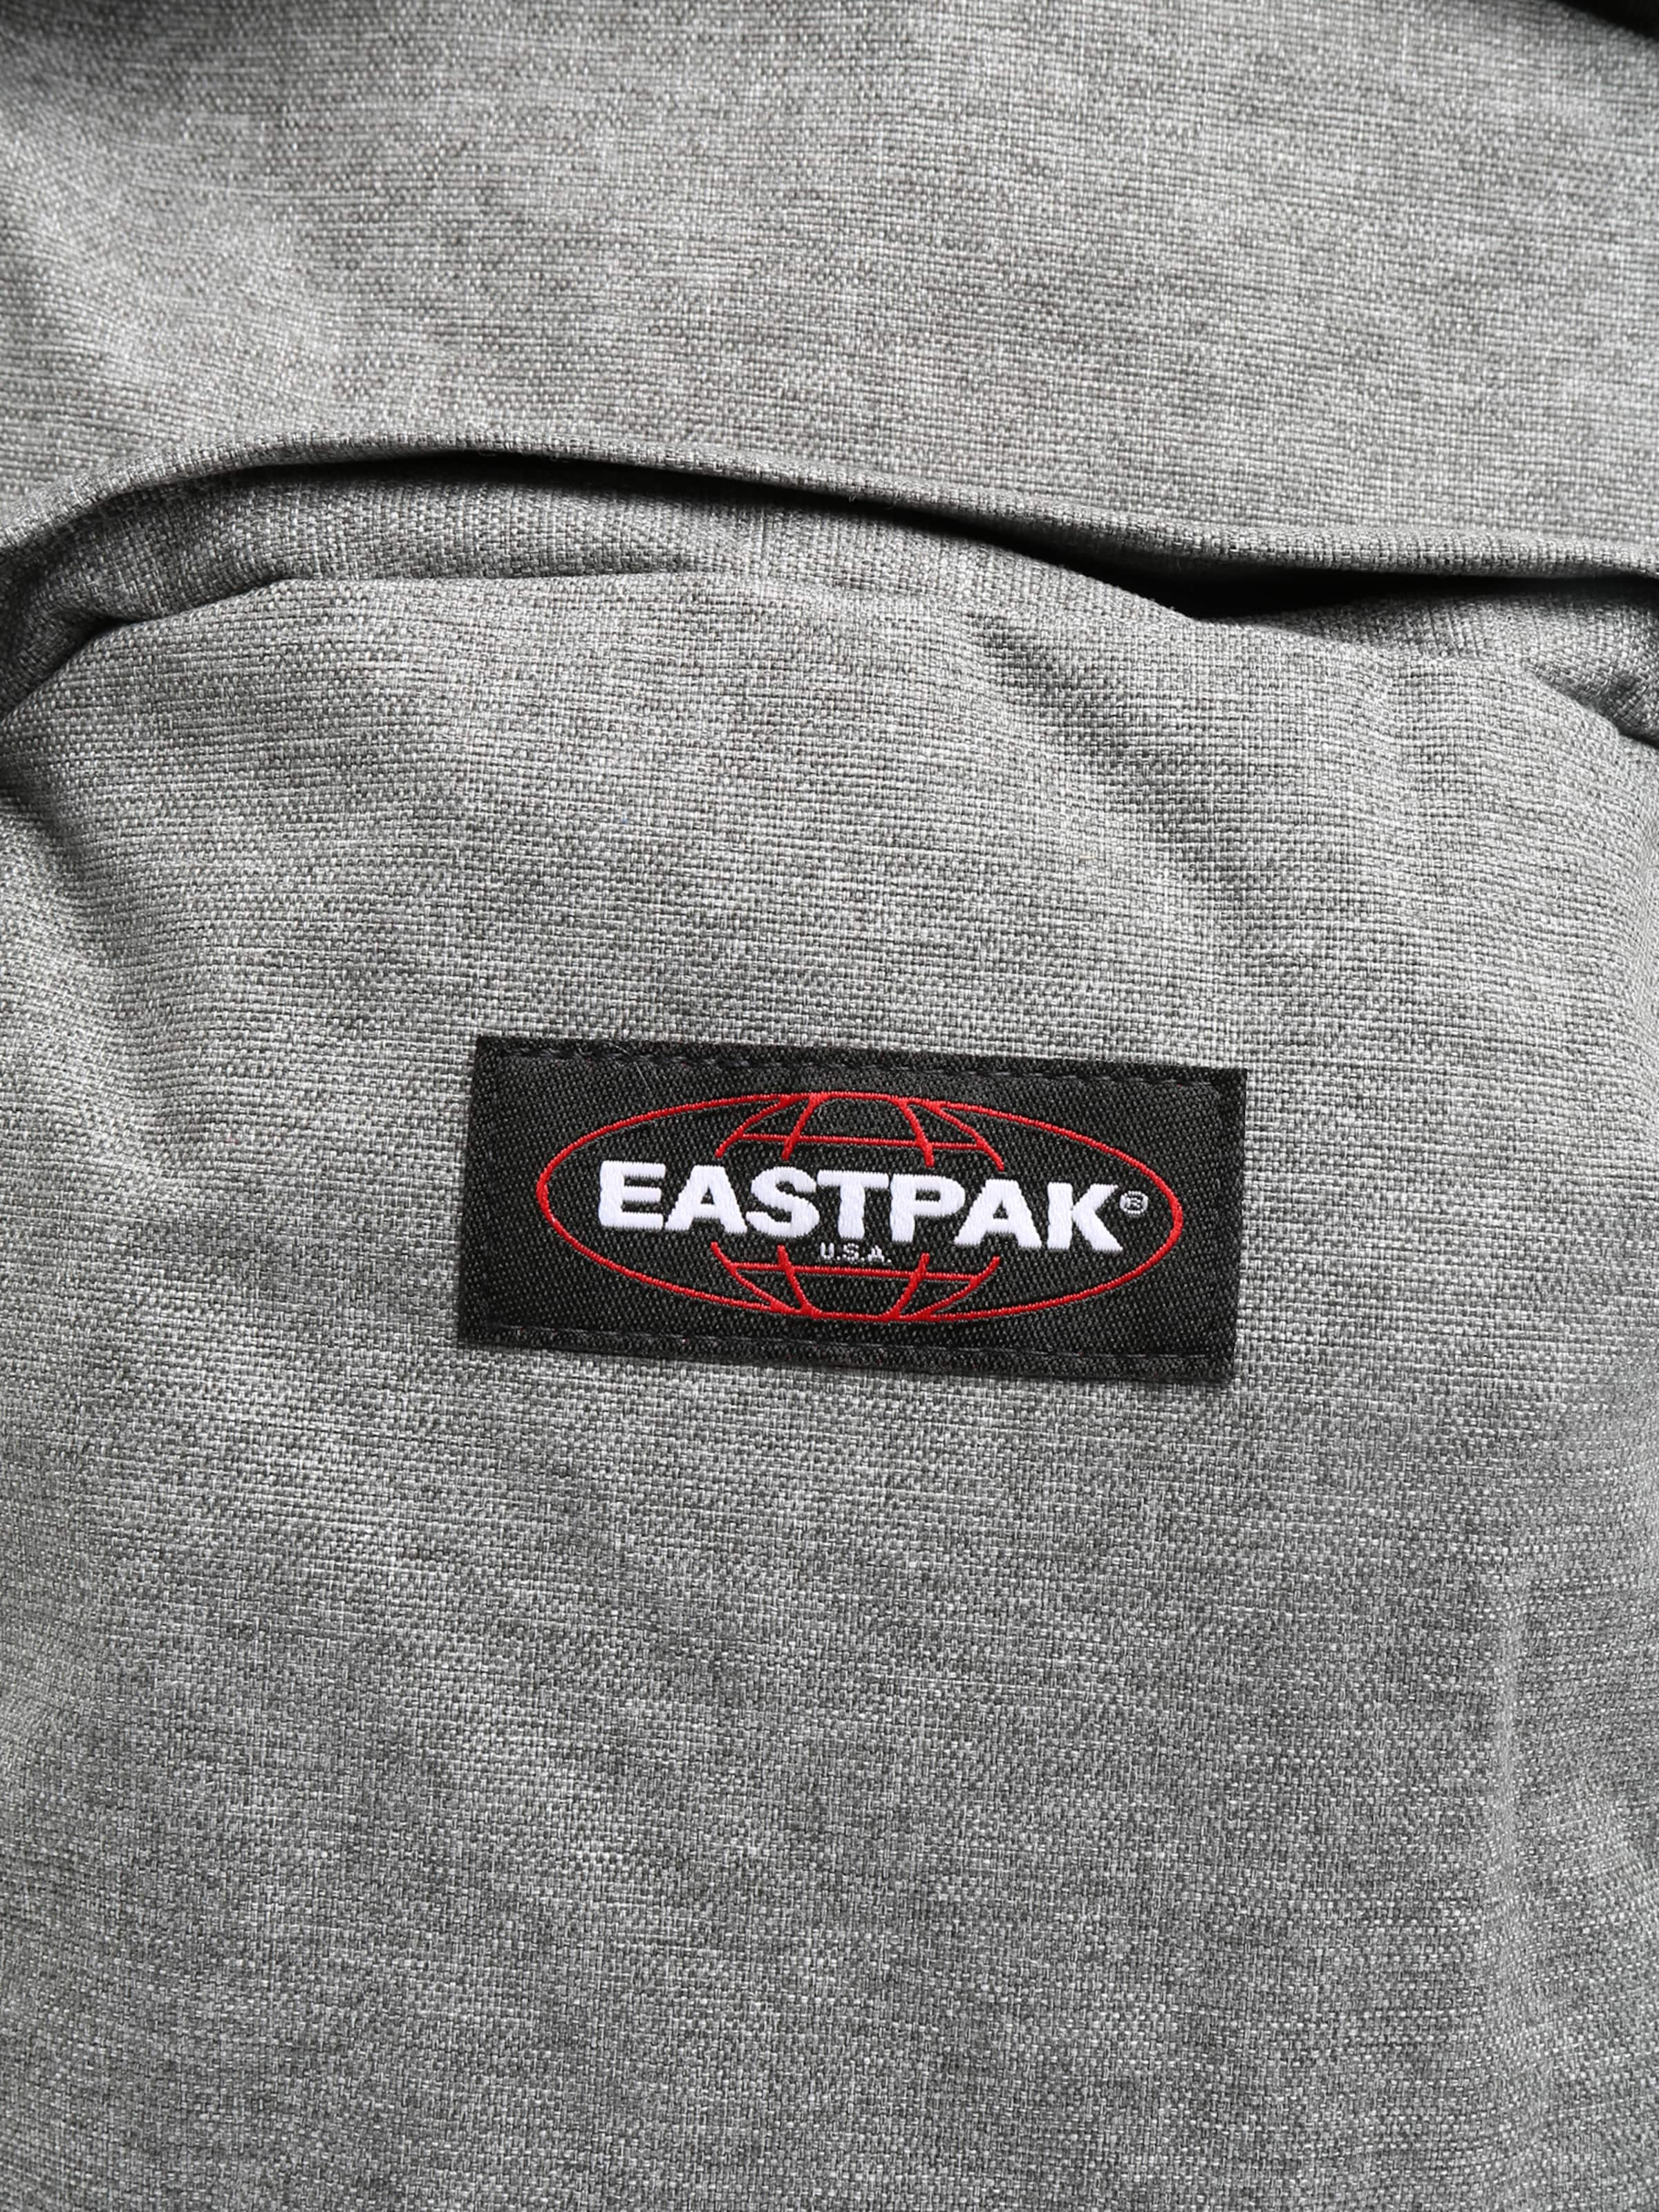 Billig Verkauf Offiziell Günstig Kaufen Geniue Händler EASTPAK Rucksack 'PROVIDER' SCLfx